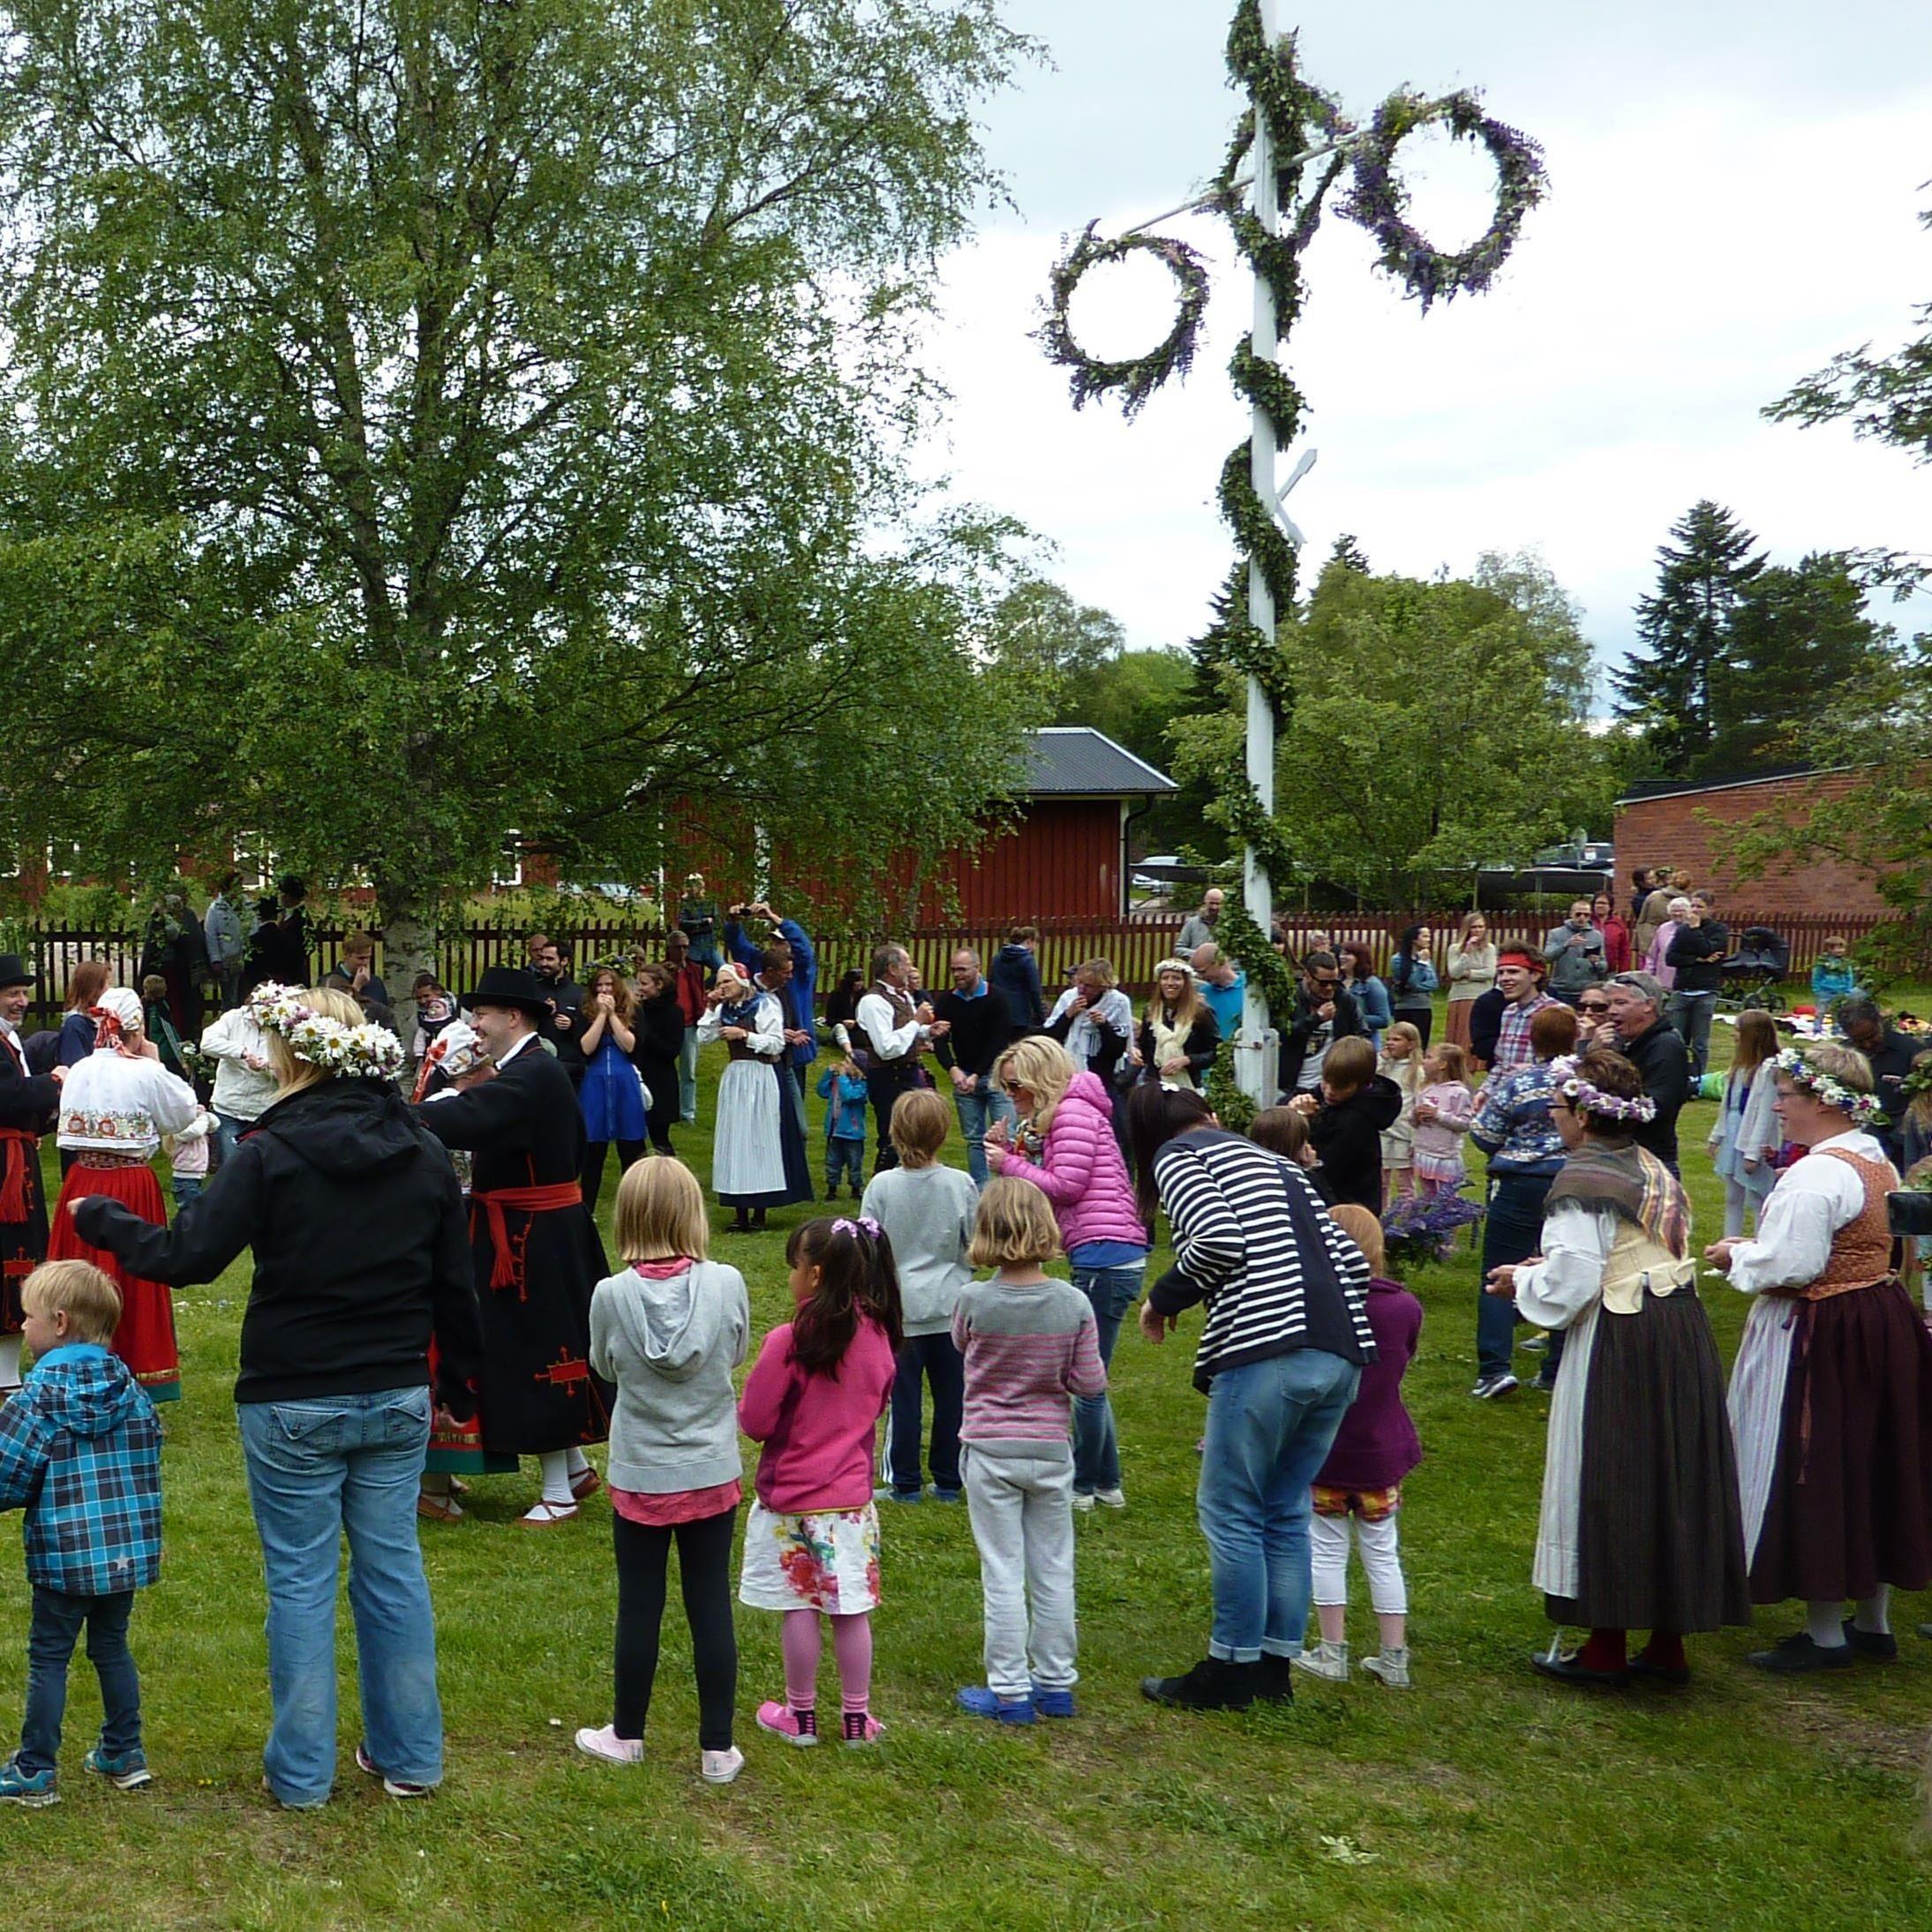 Midsummer celebrations at Garpenberg Old Farm